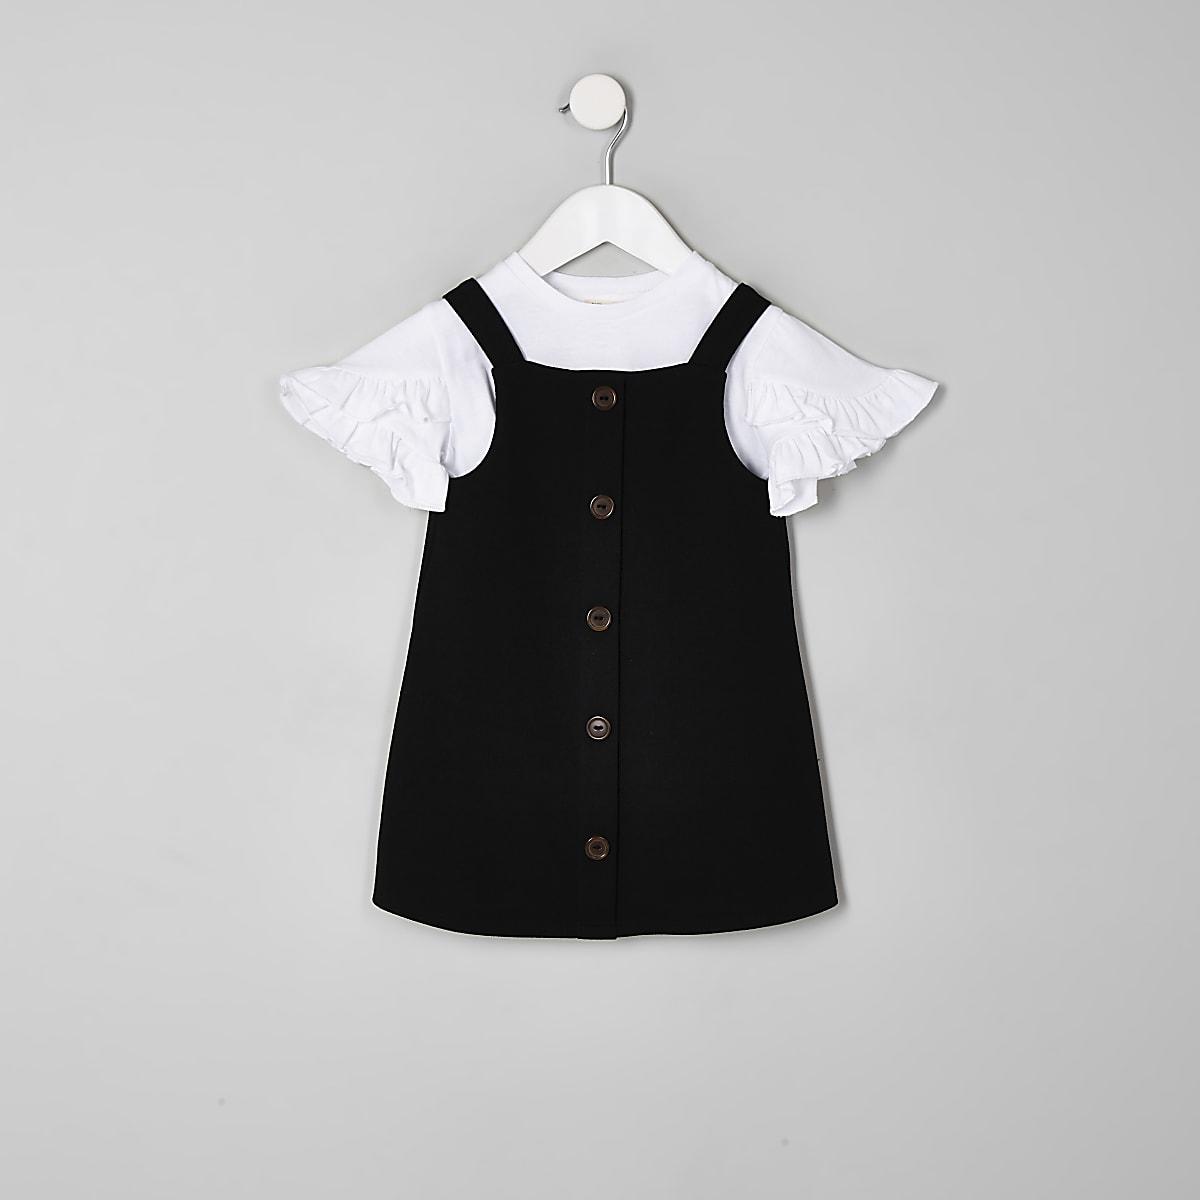 Mini girls black pinafore dress outfit